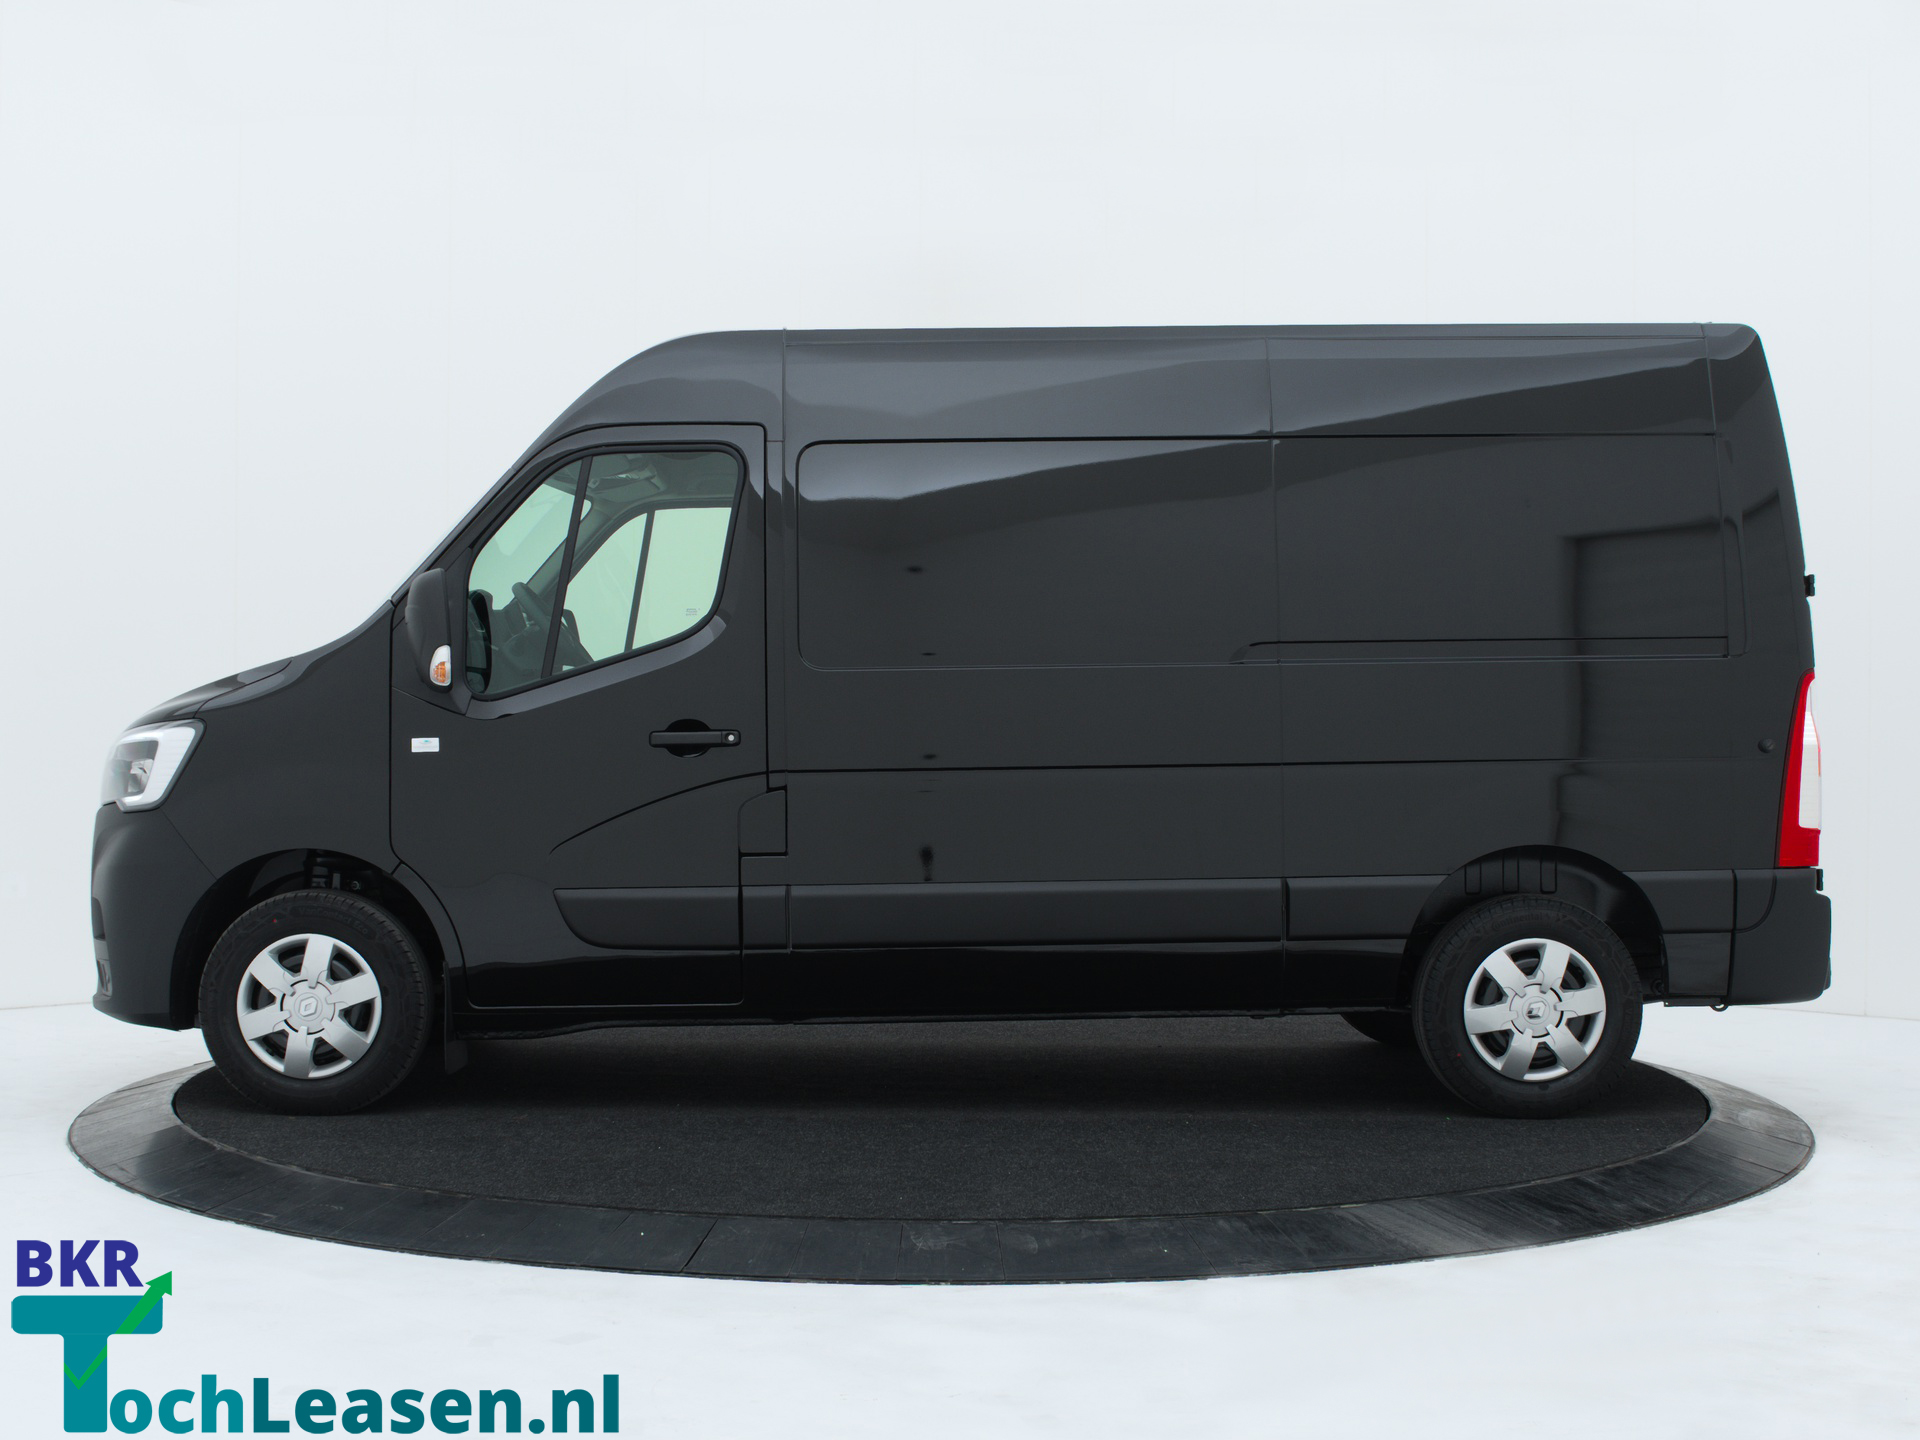 Renault Master L2H2 180 pk zwart zijkant BKR toch Leasen